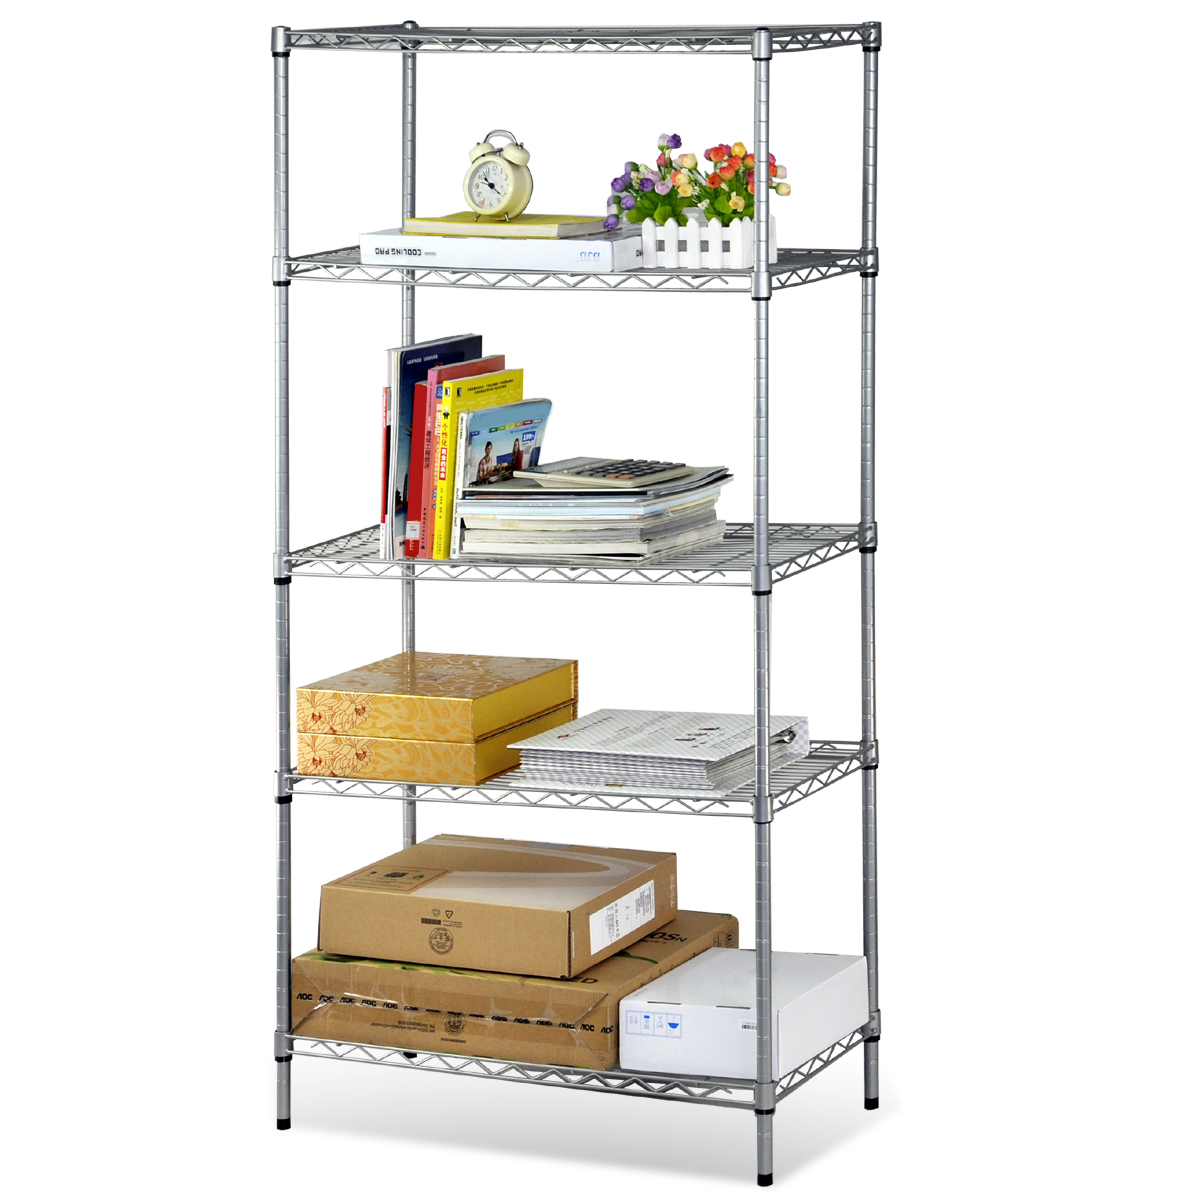 5 tier stainless steel chrome kitchen storage shelves new. Black Bedroom Furniture Sets. Home Design Ideas